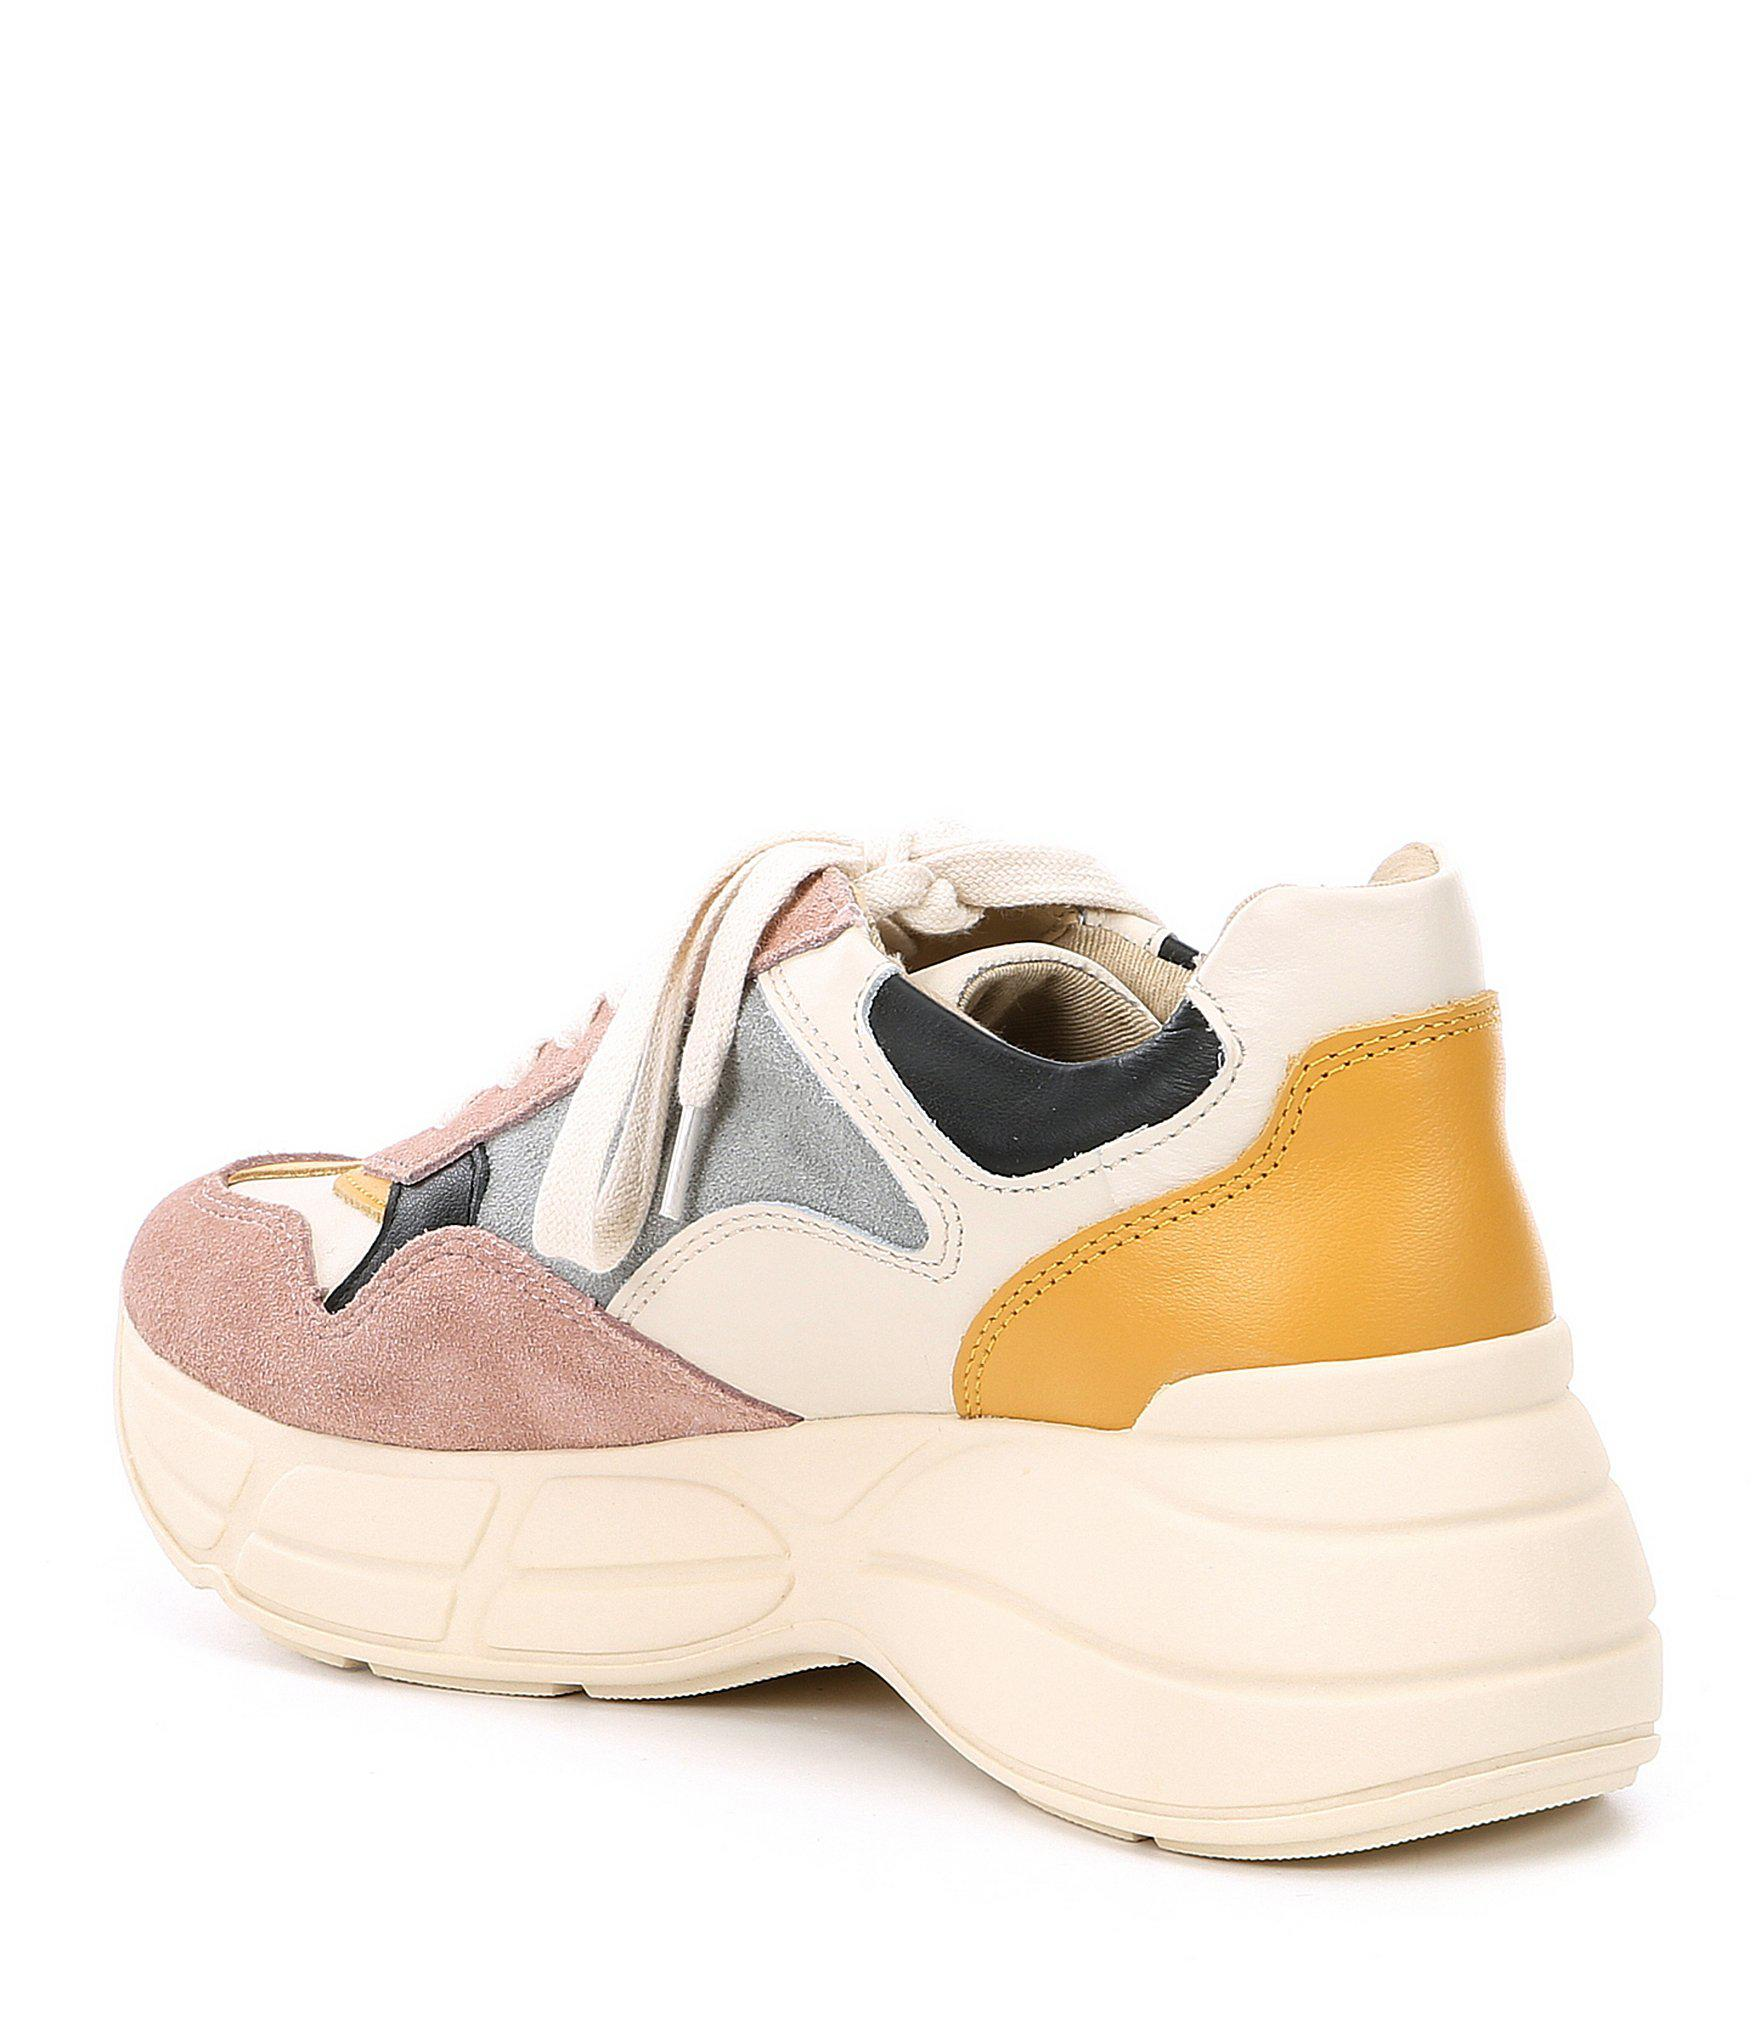 cbf772def11 Steve Madden - Pink Memory Leather Color Block Sneakers - Lyst. View  fullscreen